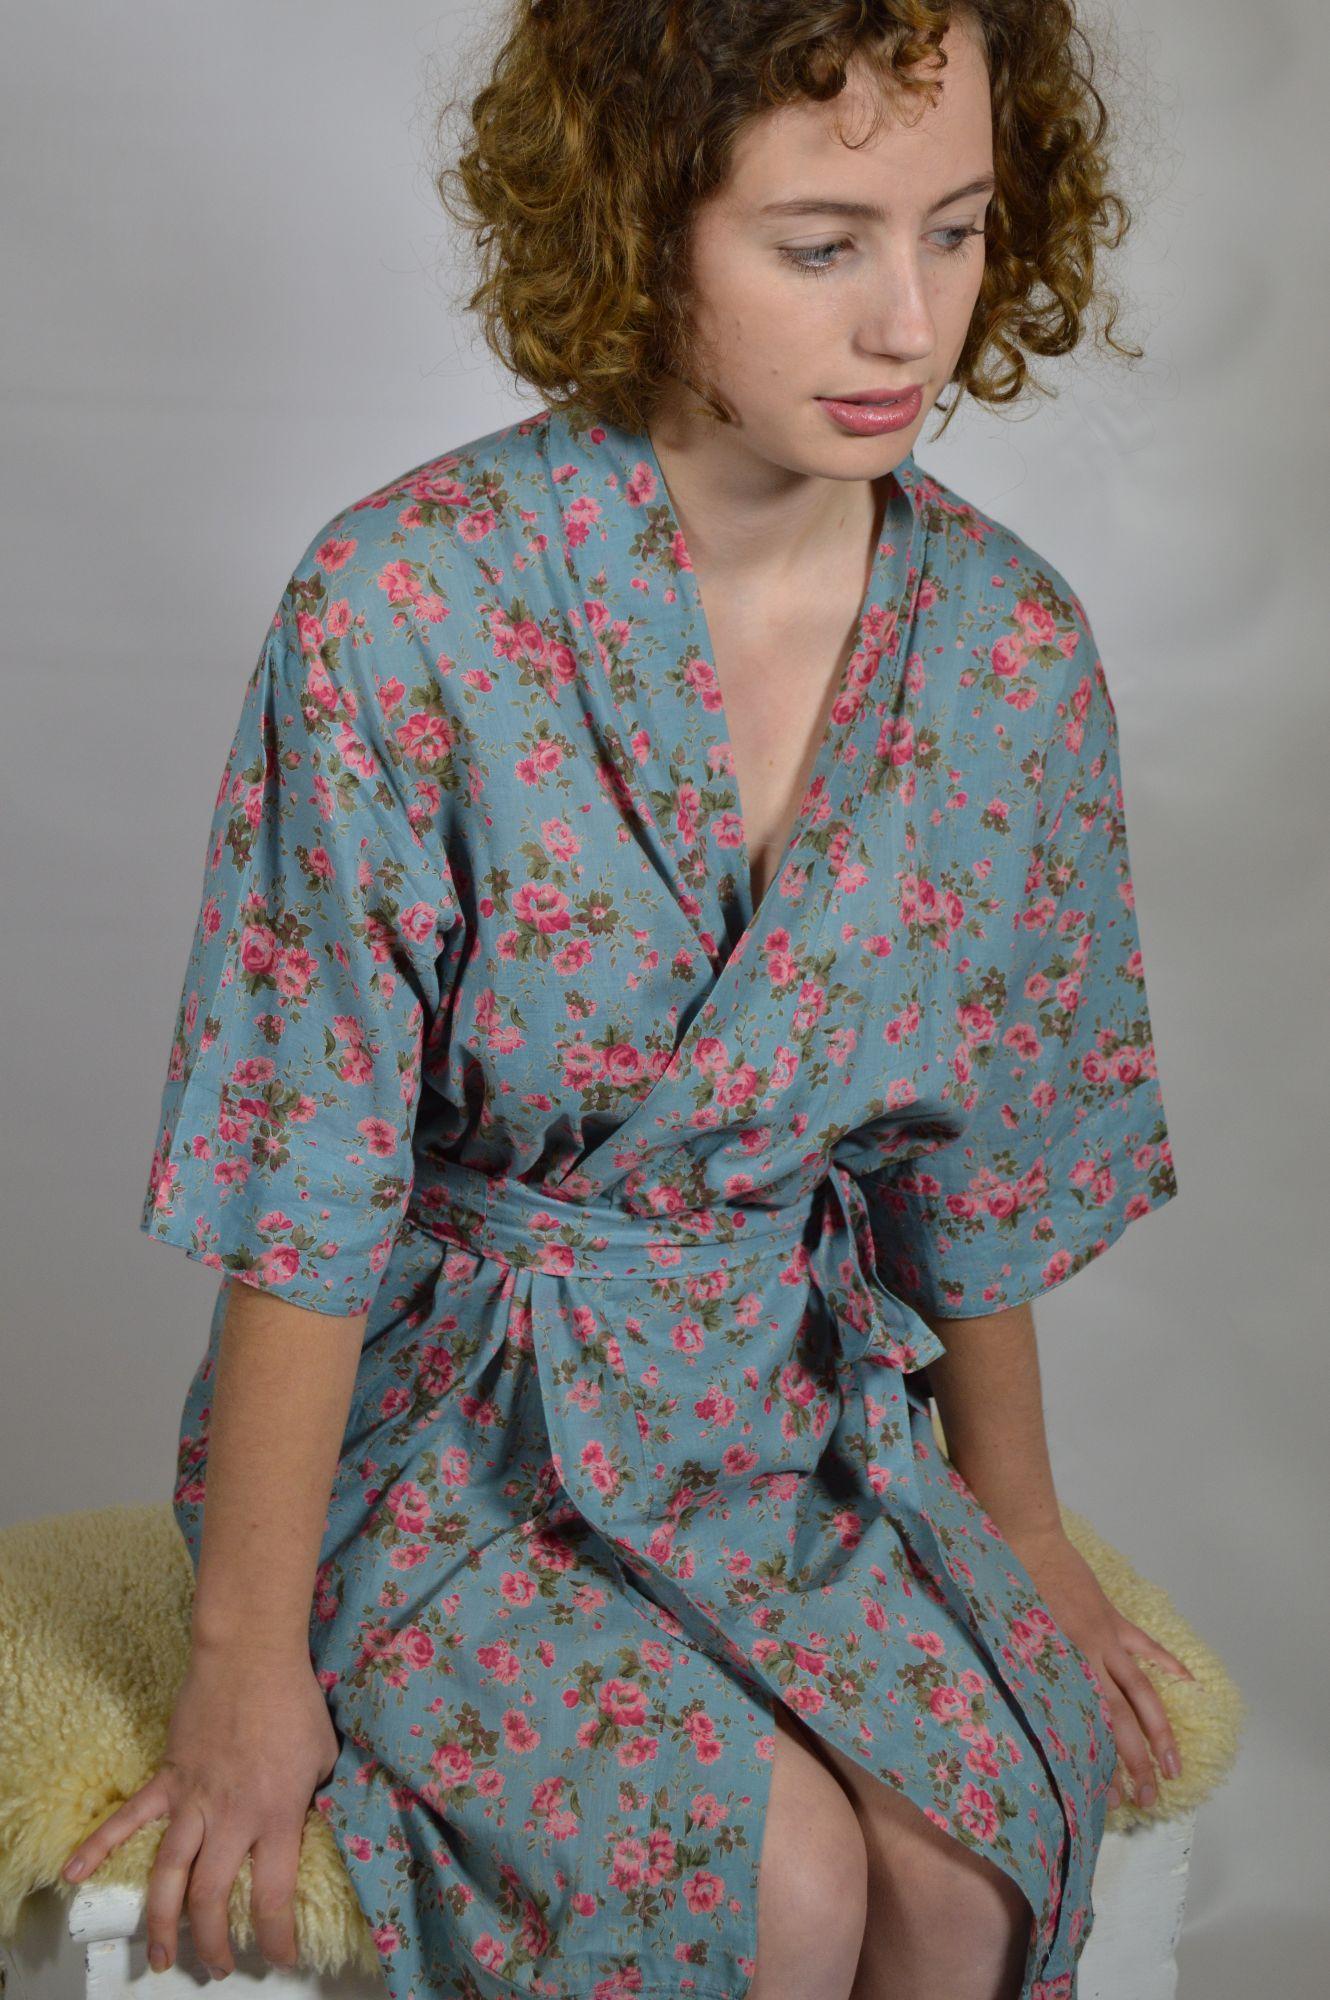 Short Kimono Dressing Gown - Short Summer Dressing Gown Blue Floral